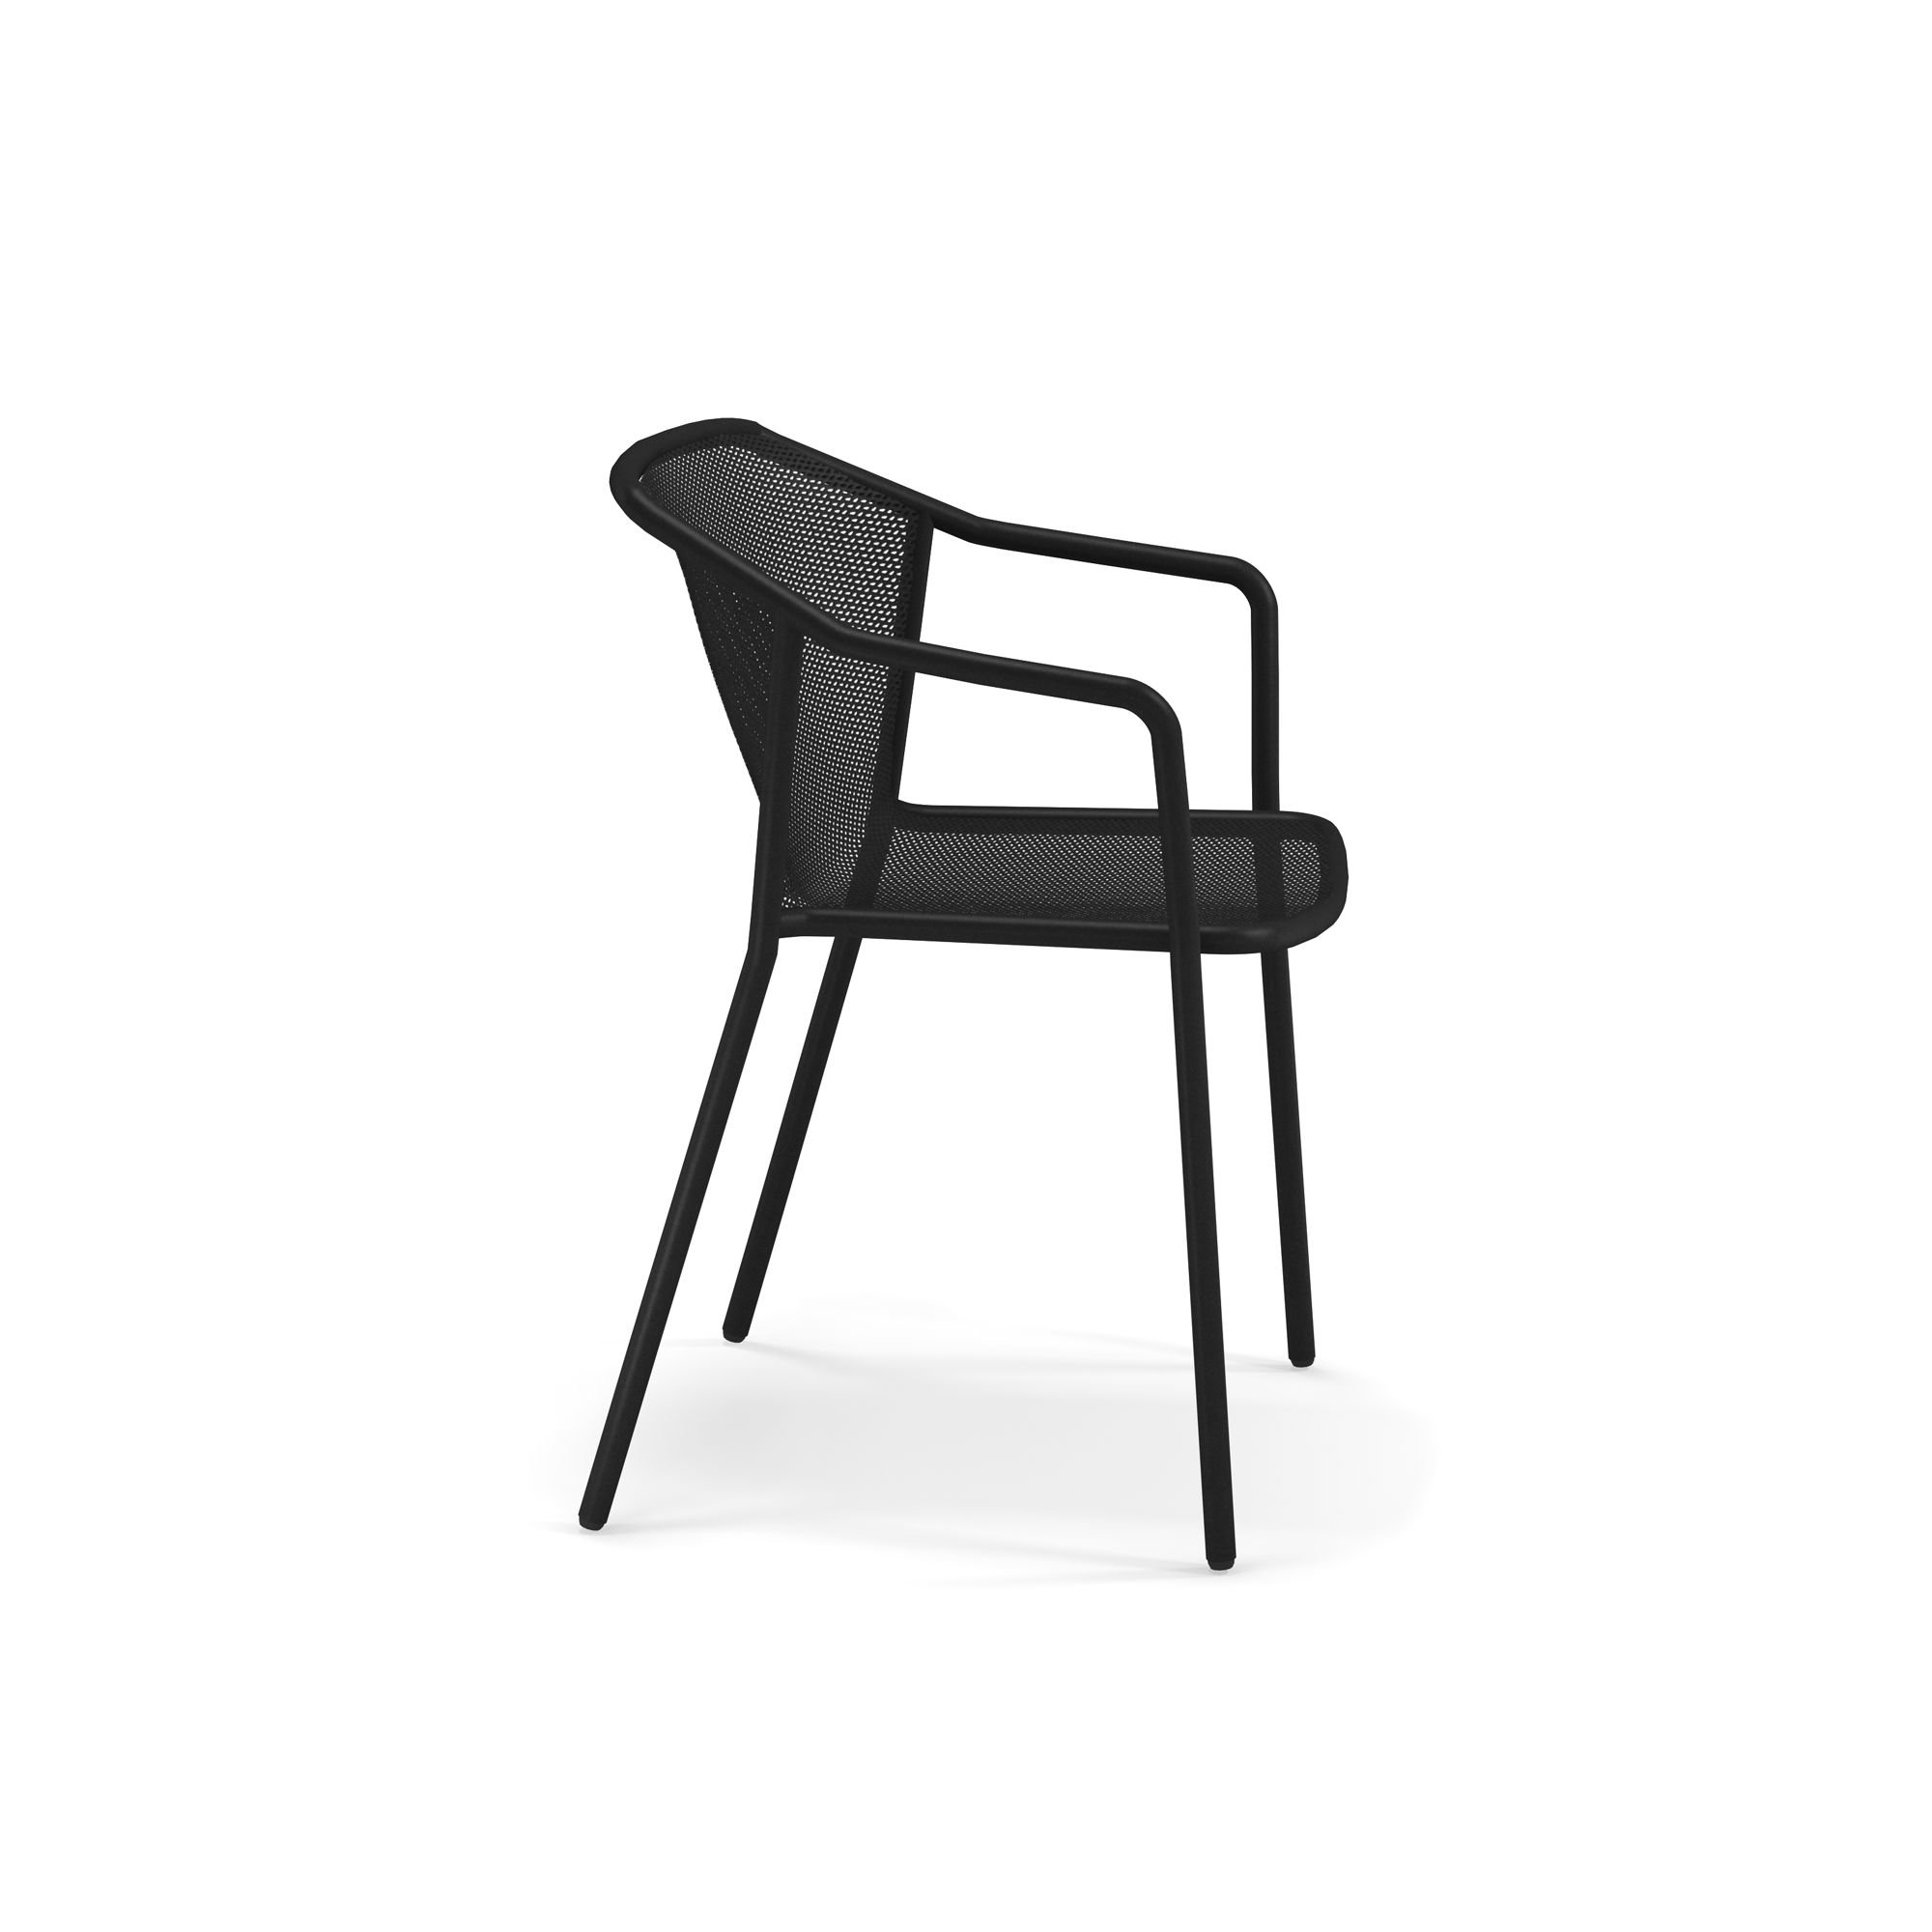 Darwin 522 chair from Emu